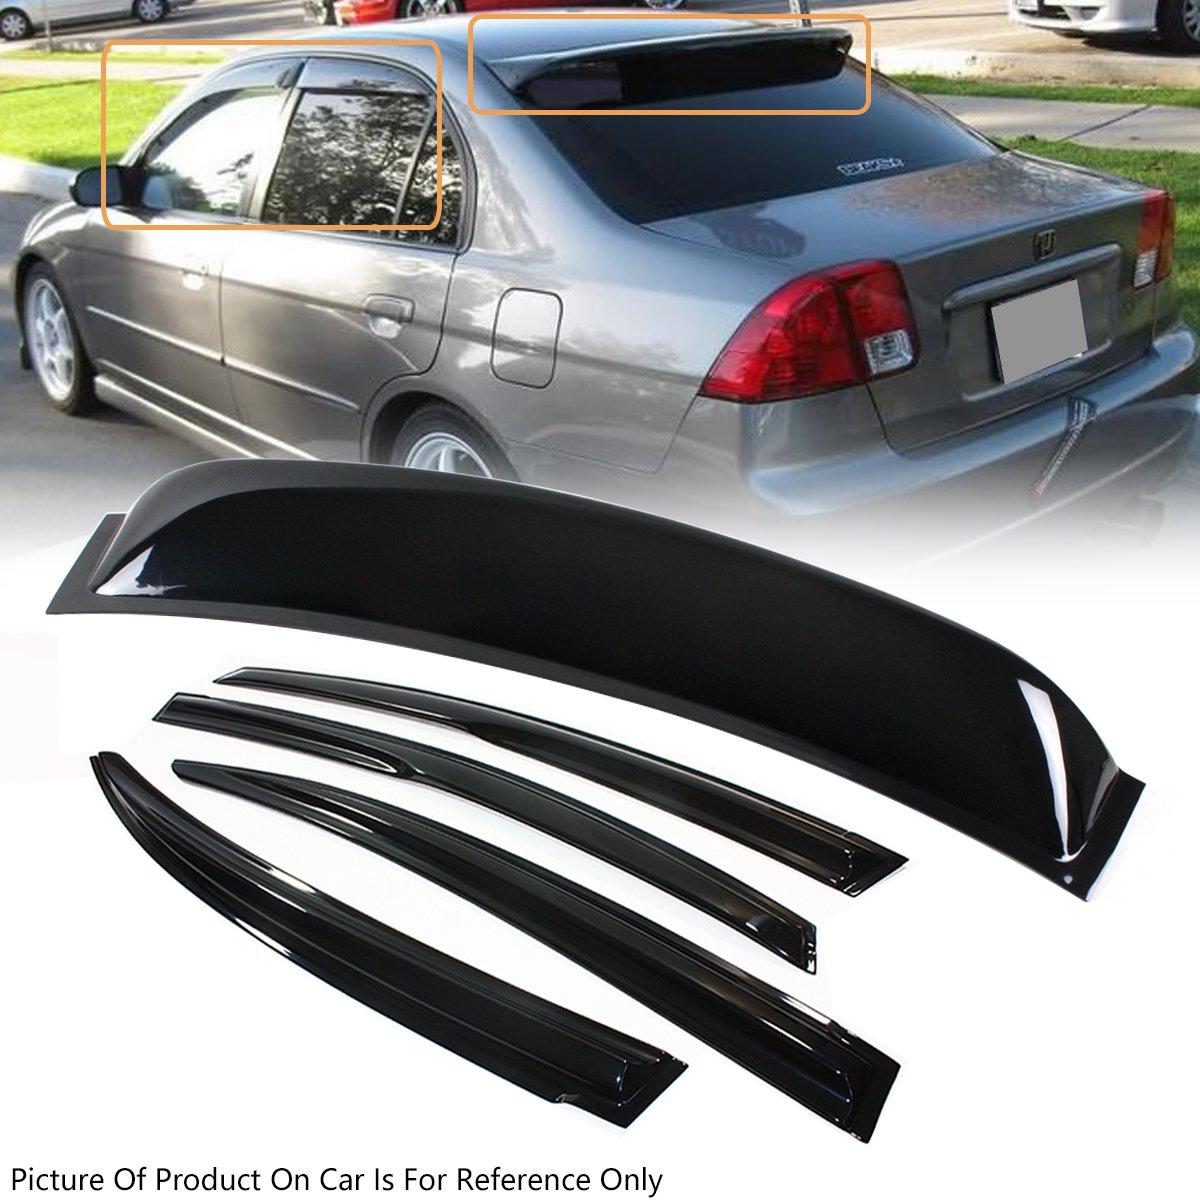 LT Sport SN#100000000554-201 for Honda Civic Rear Window Spoiler Acrylic Rear Visor Deflector